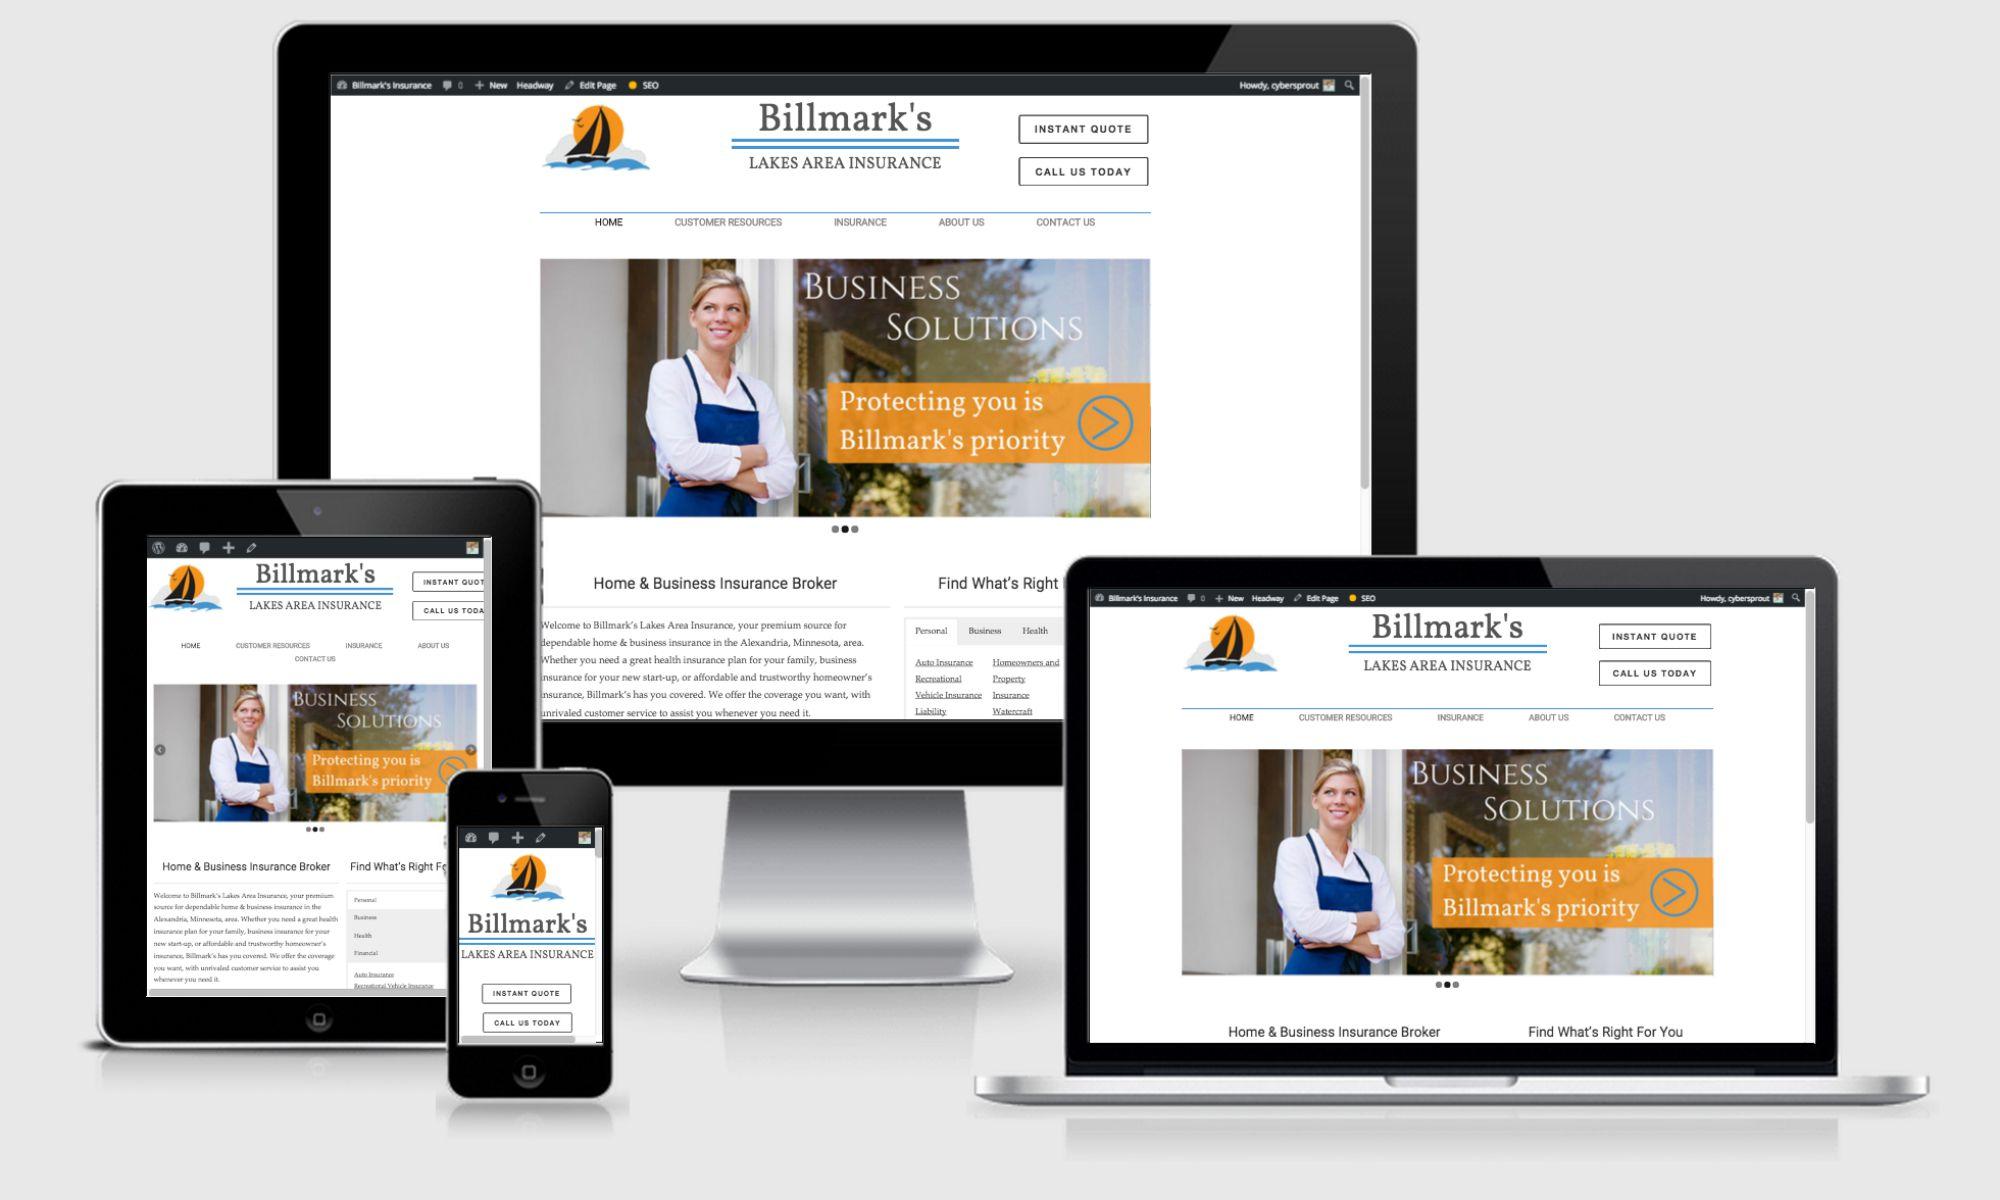 Billmark's website design screenshot